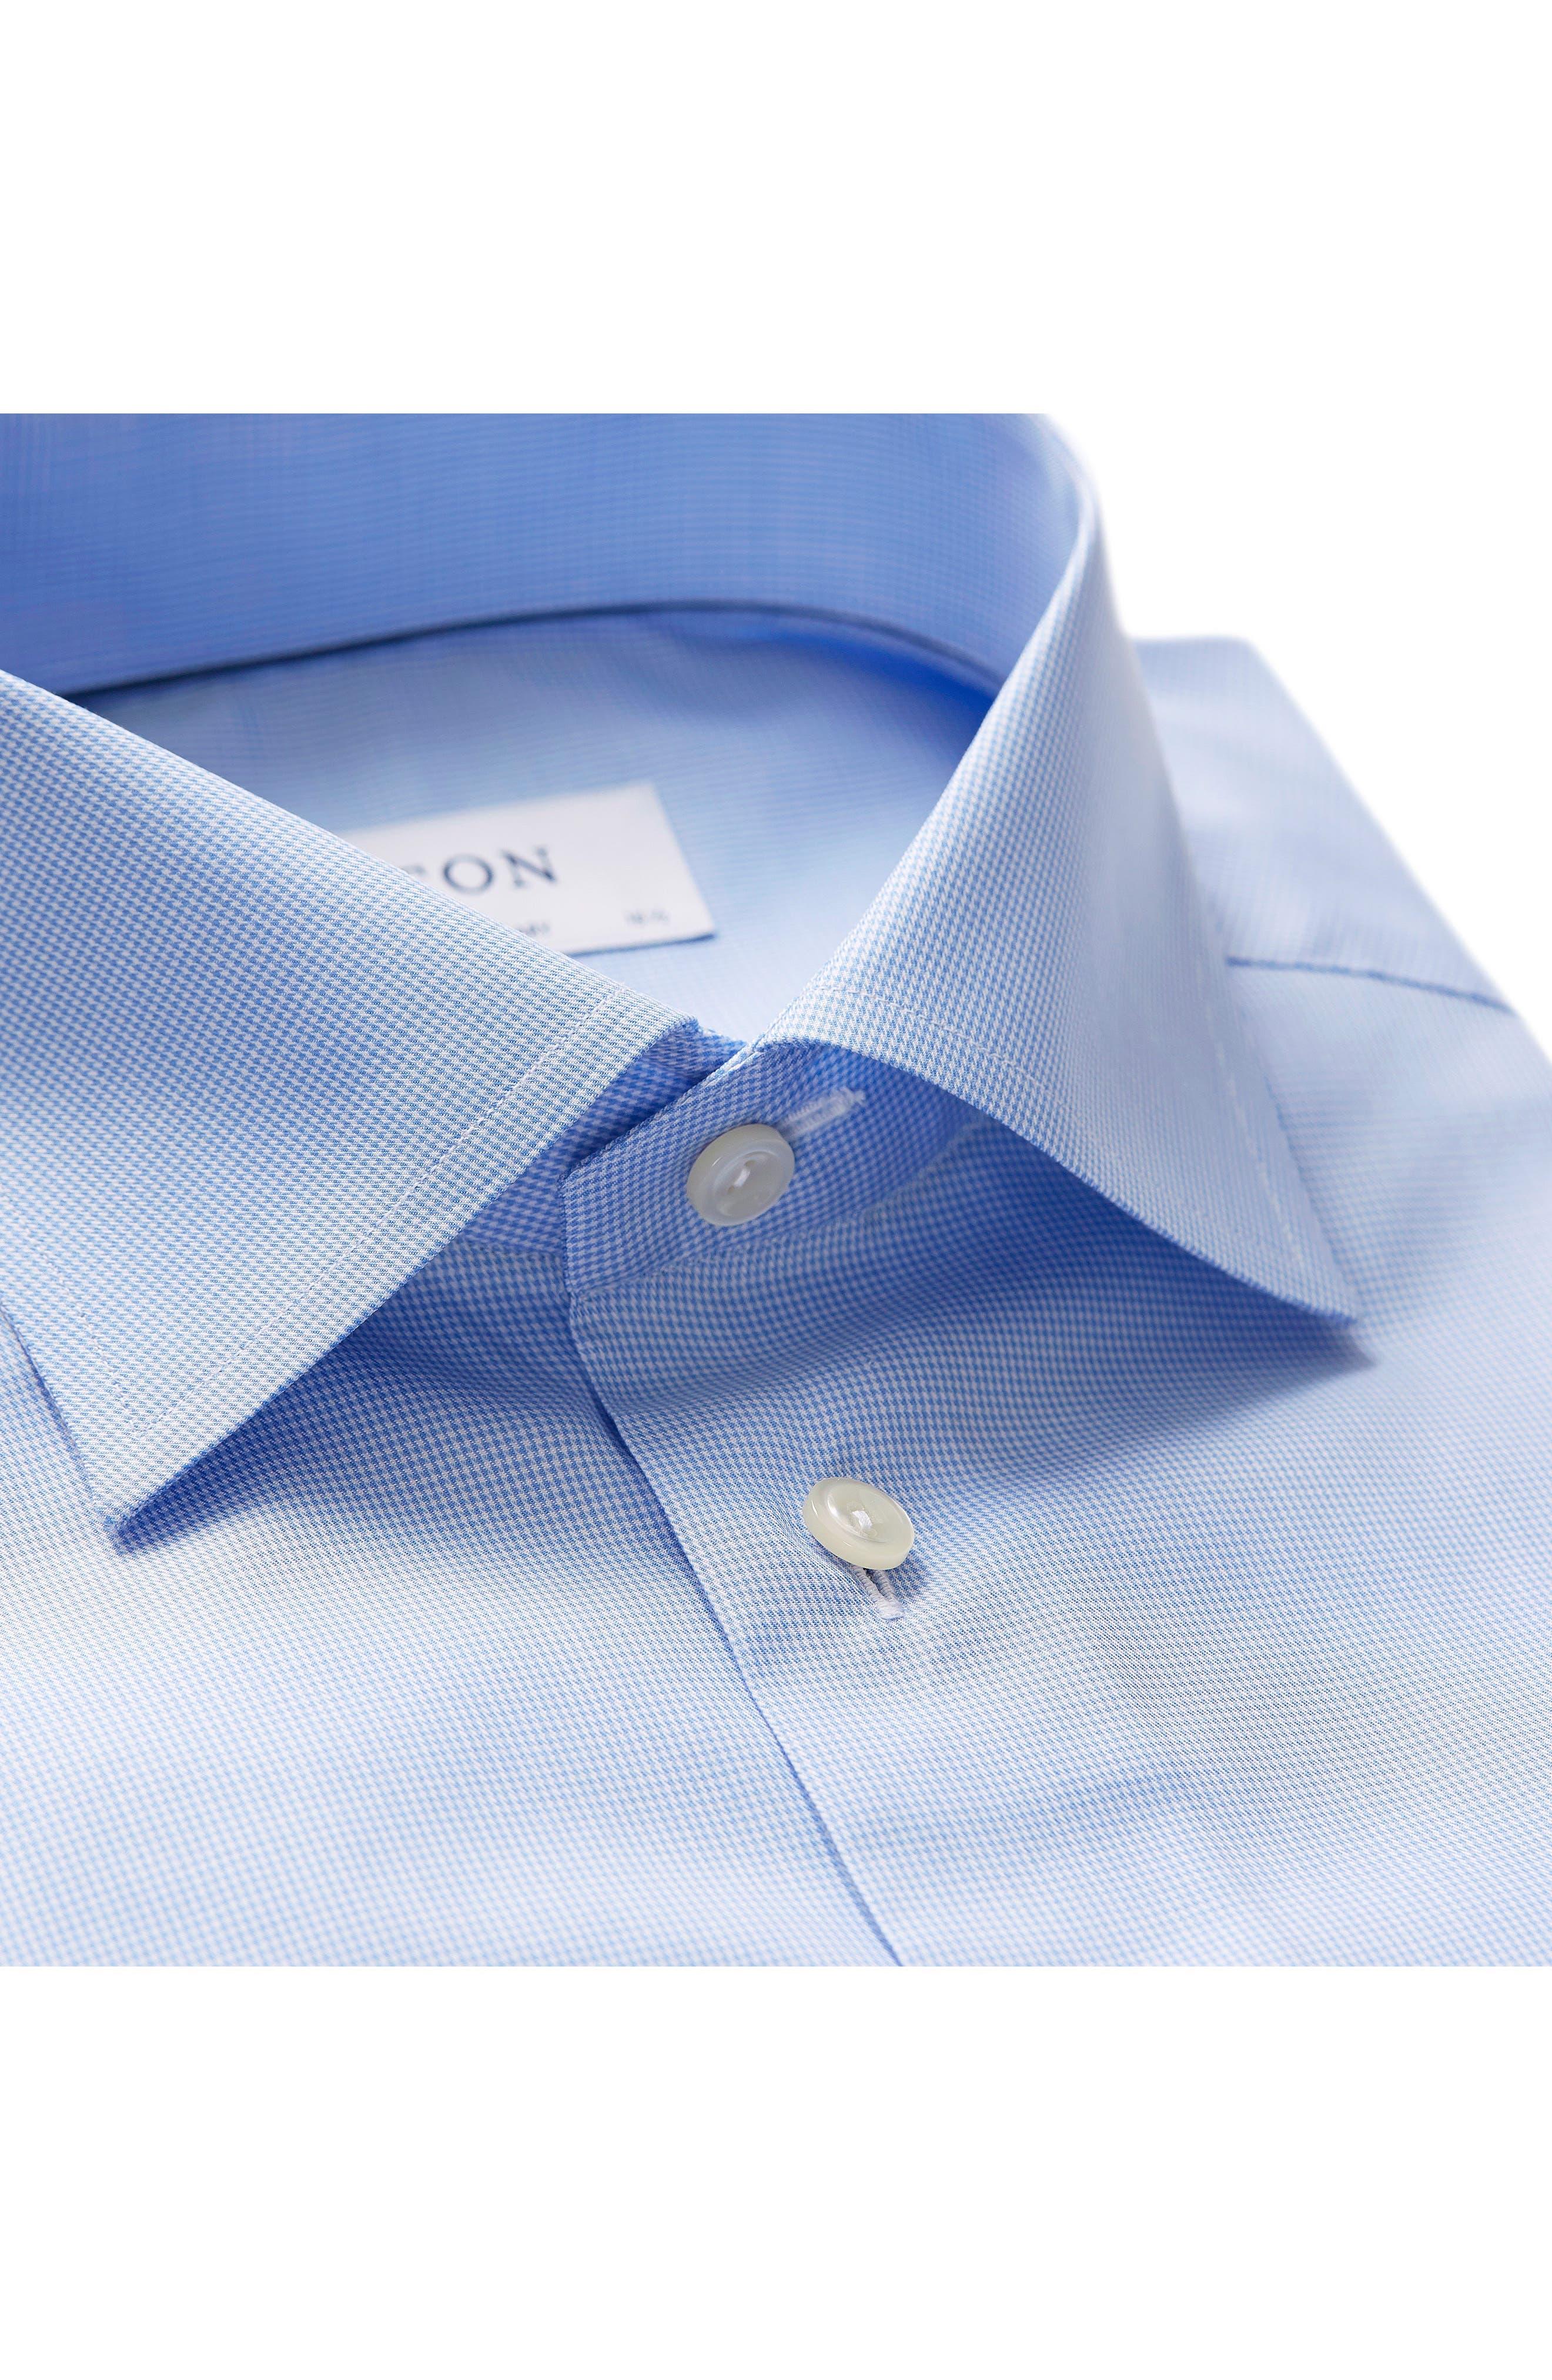 Alternate Image 5  - Eton Contemporary Fit Houndstooth Dress Shirt